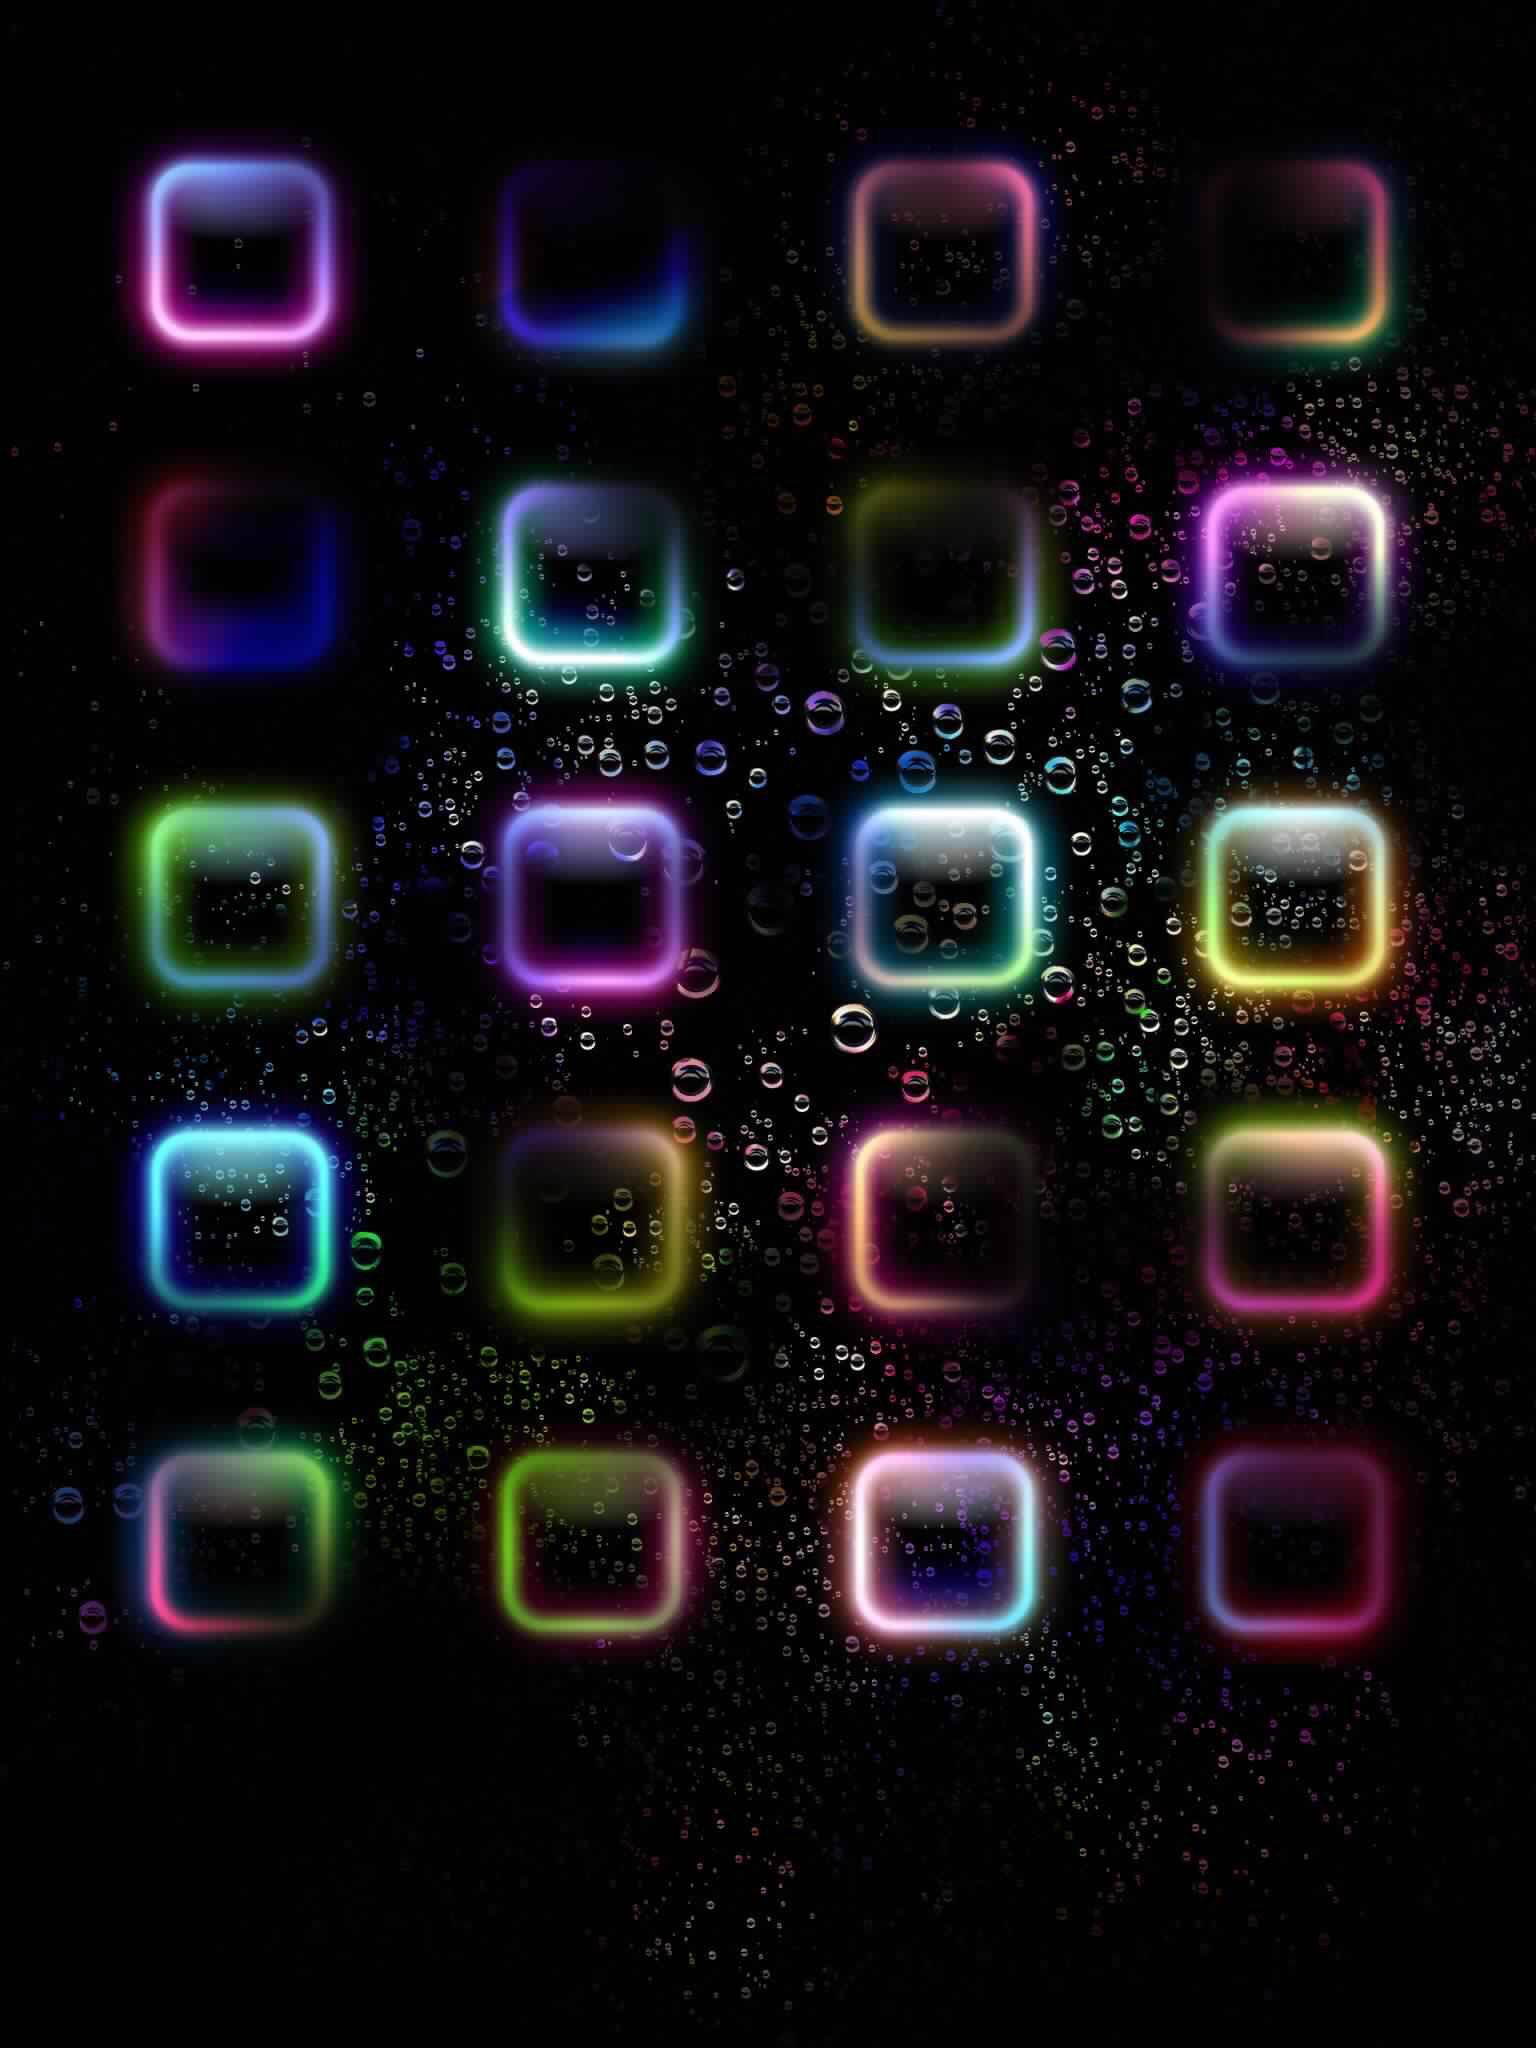 App Icon Skin Wallpaper New Backgrounds Ipad Mini Screens